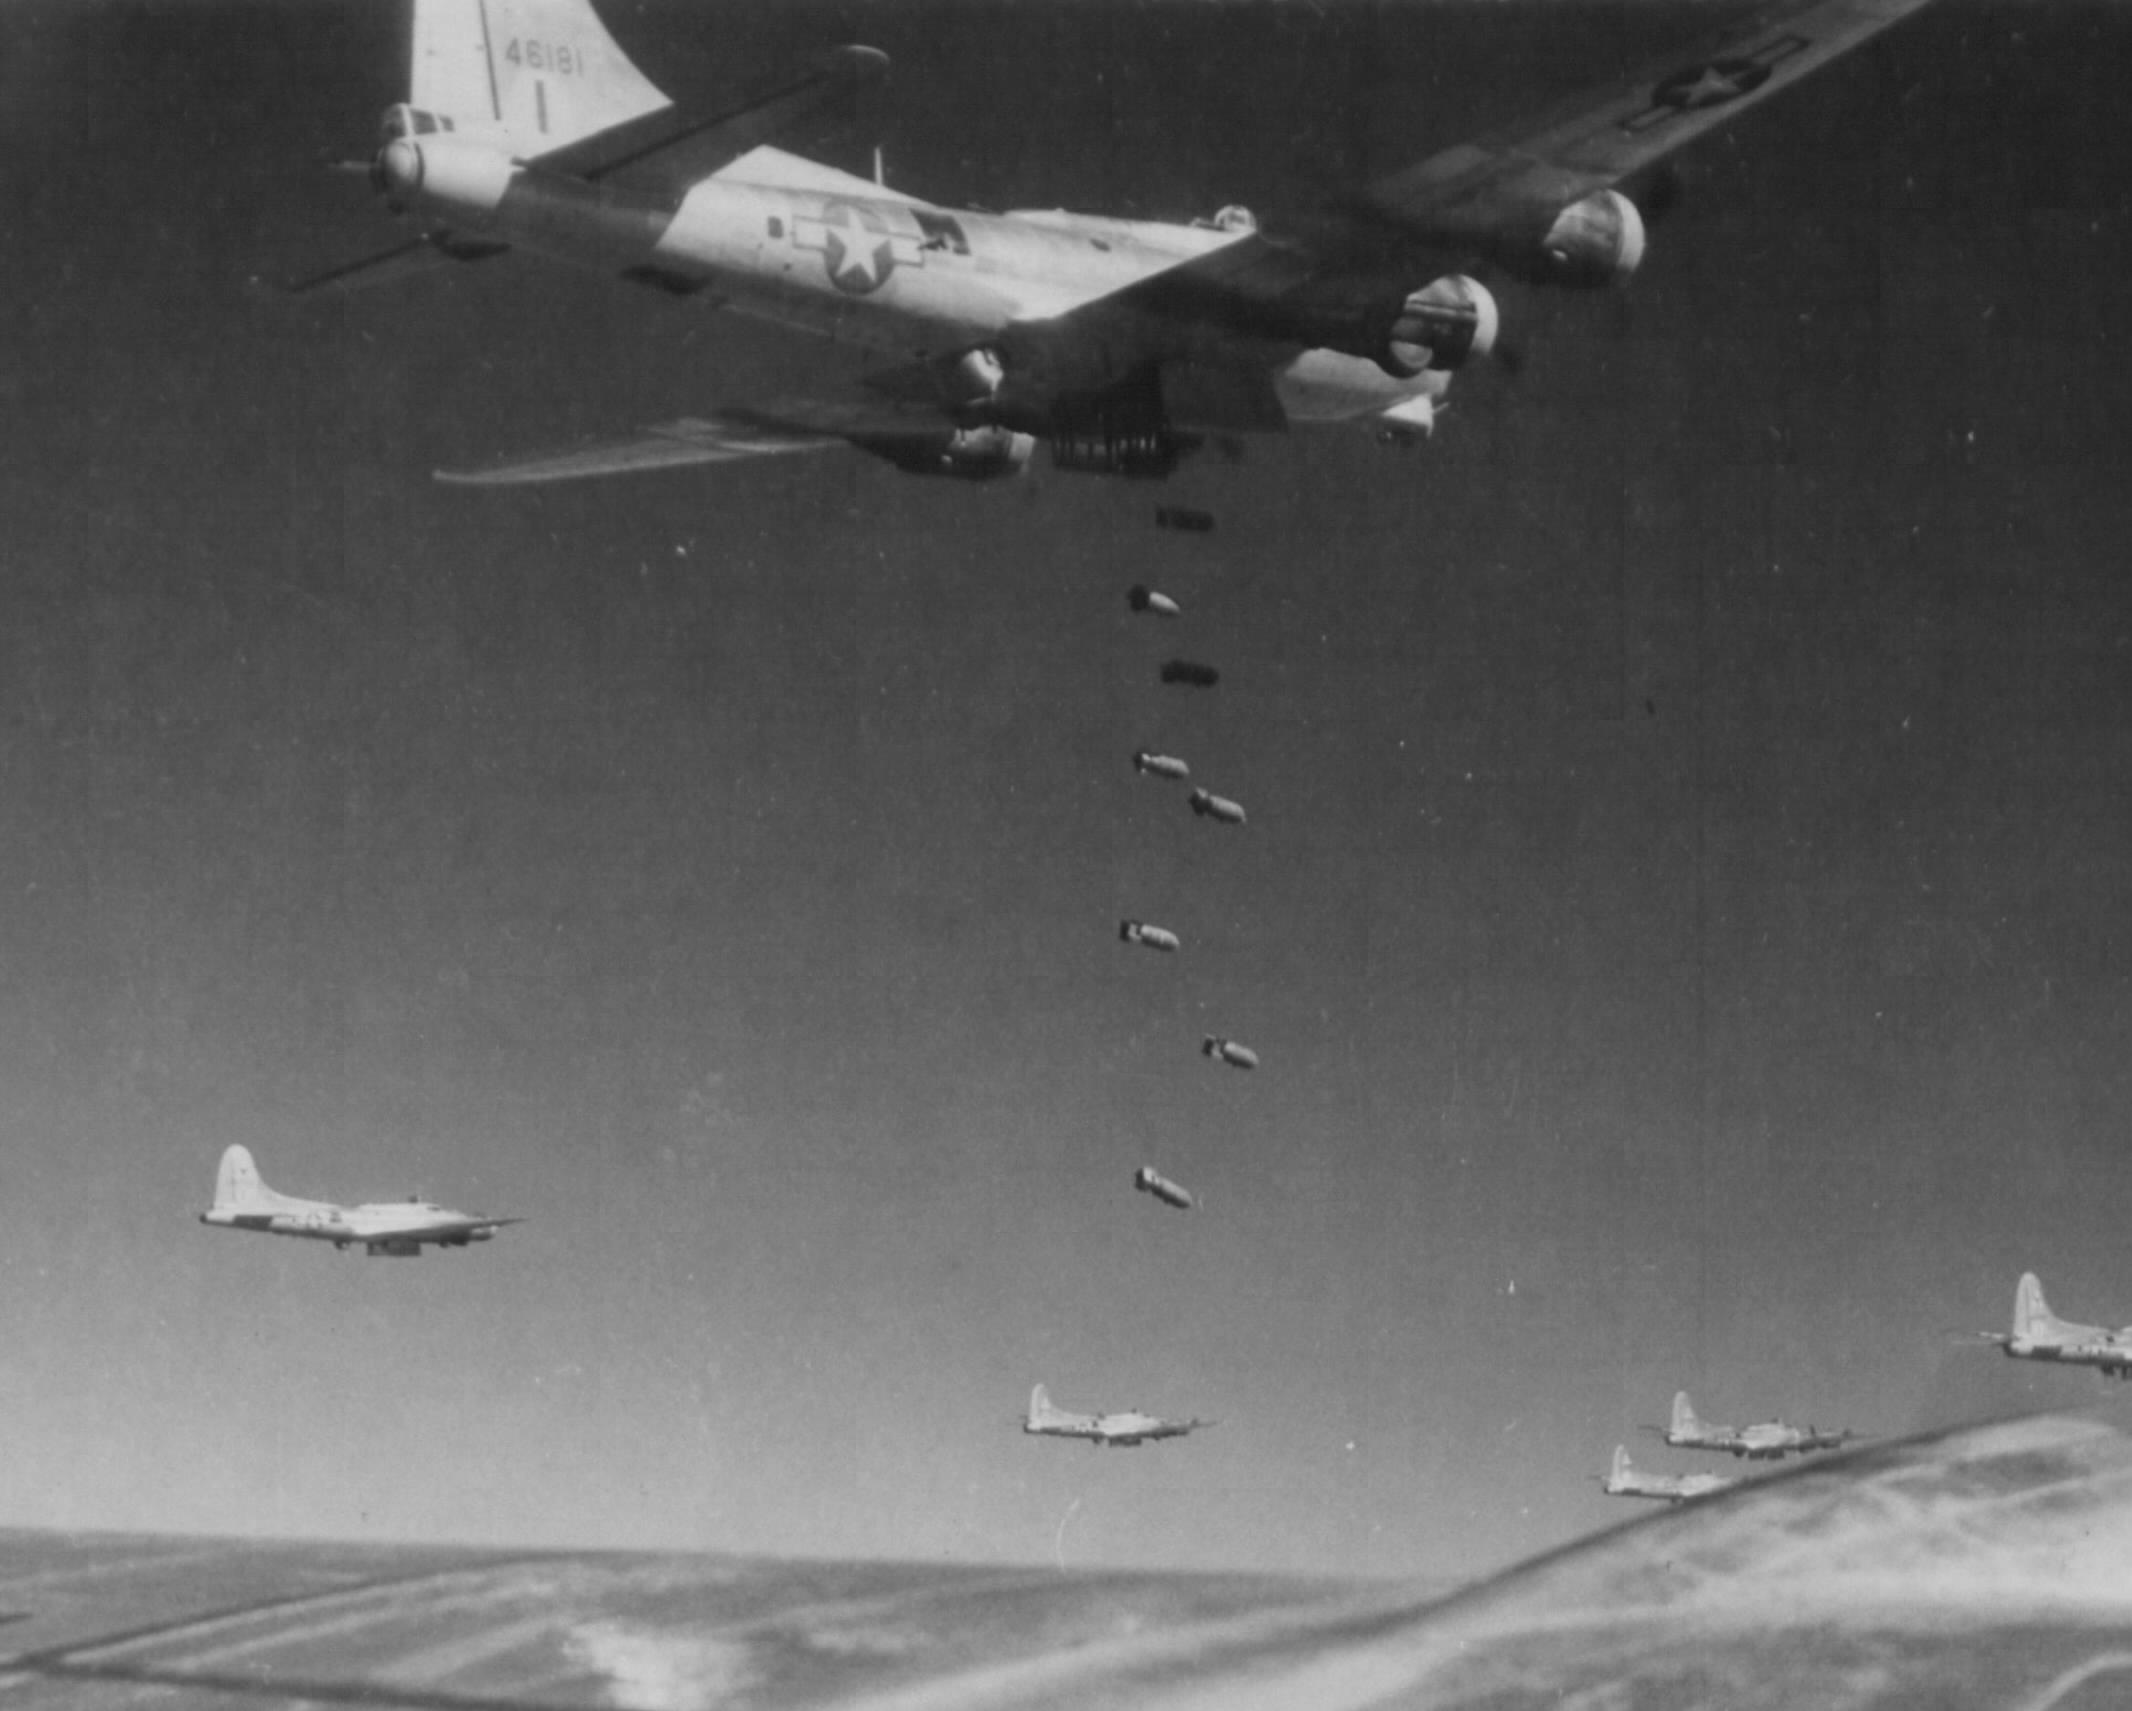 B-17 44-6181